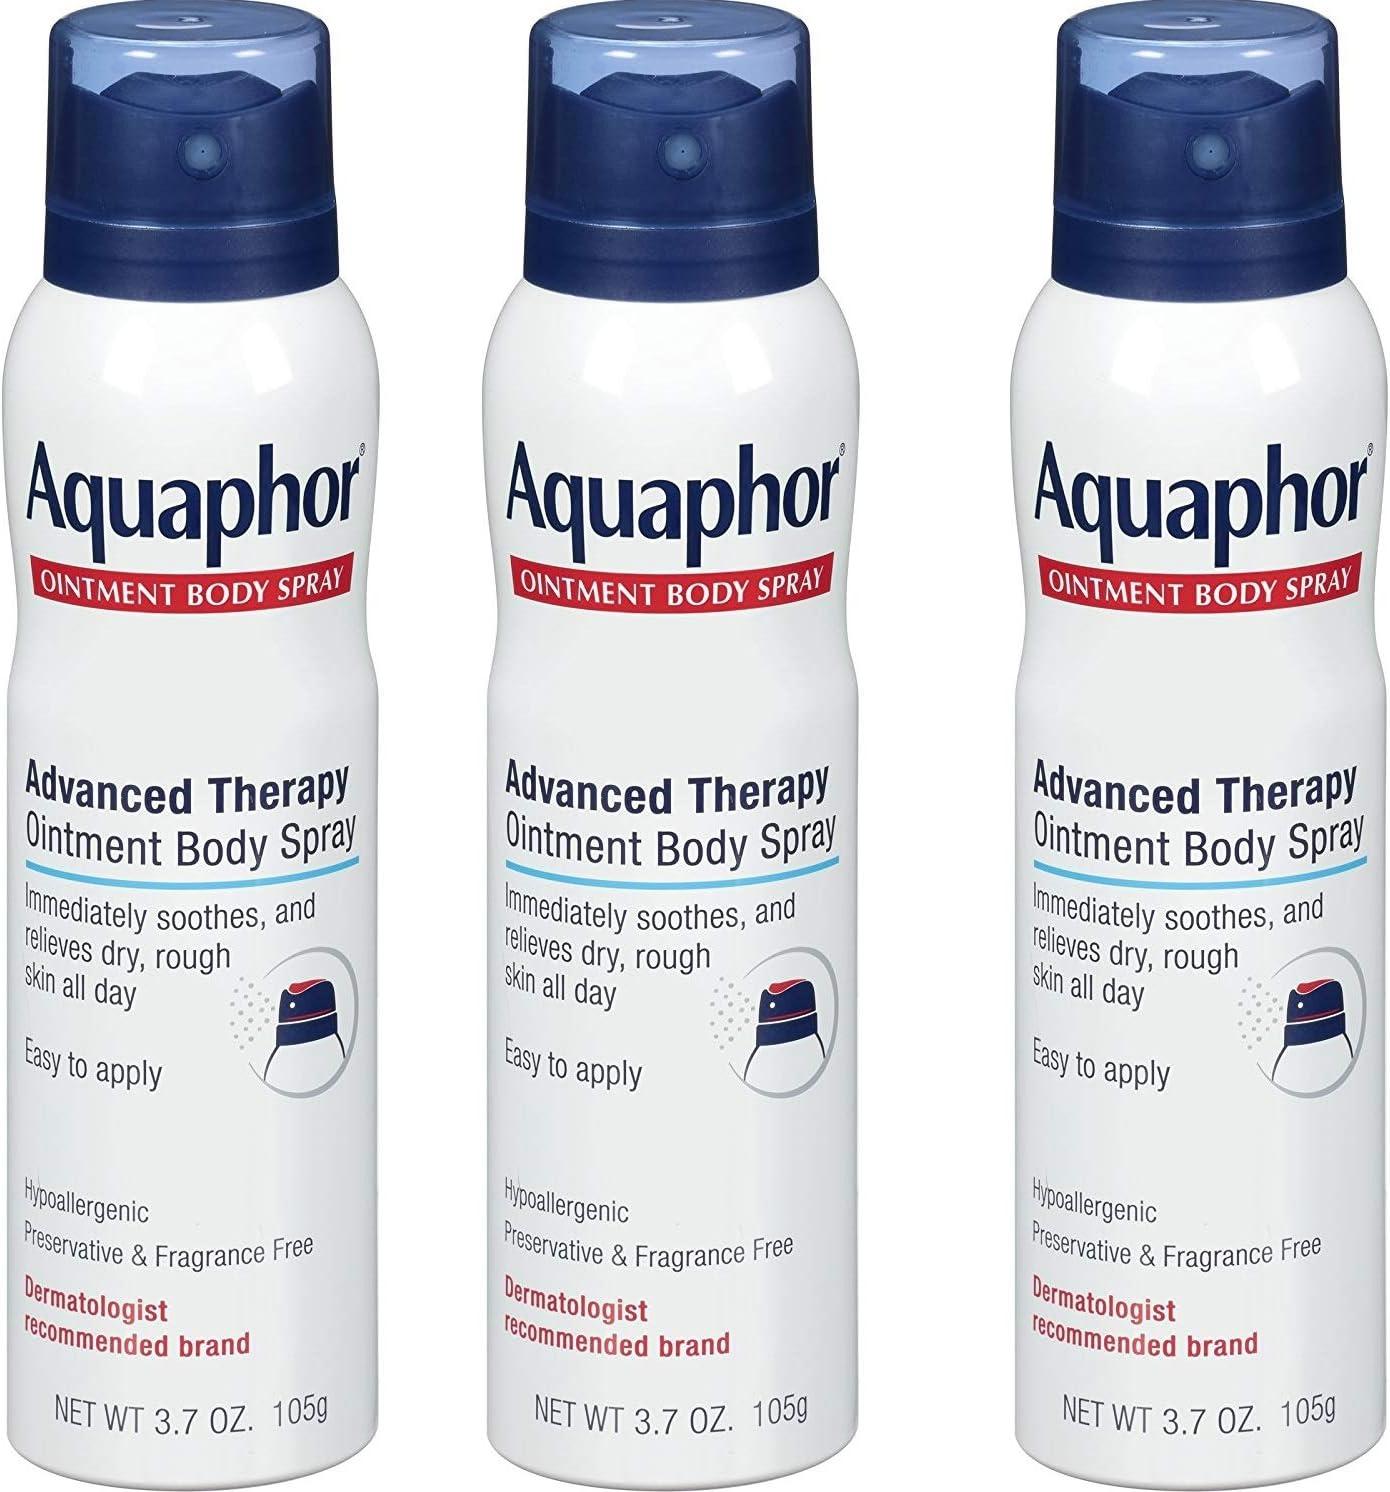 Aquaphor Ointment Body Spray - Moisturizes and Heals Dry, Rough Skin - 3.7 oz. Spray Can, iBCCvR 3 Pack